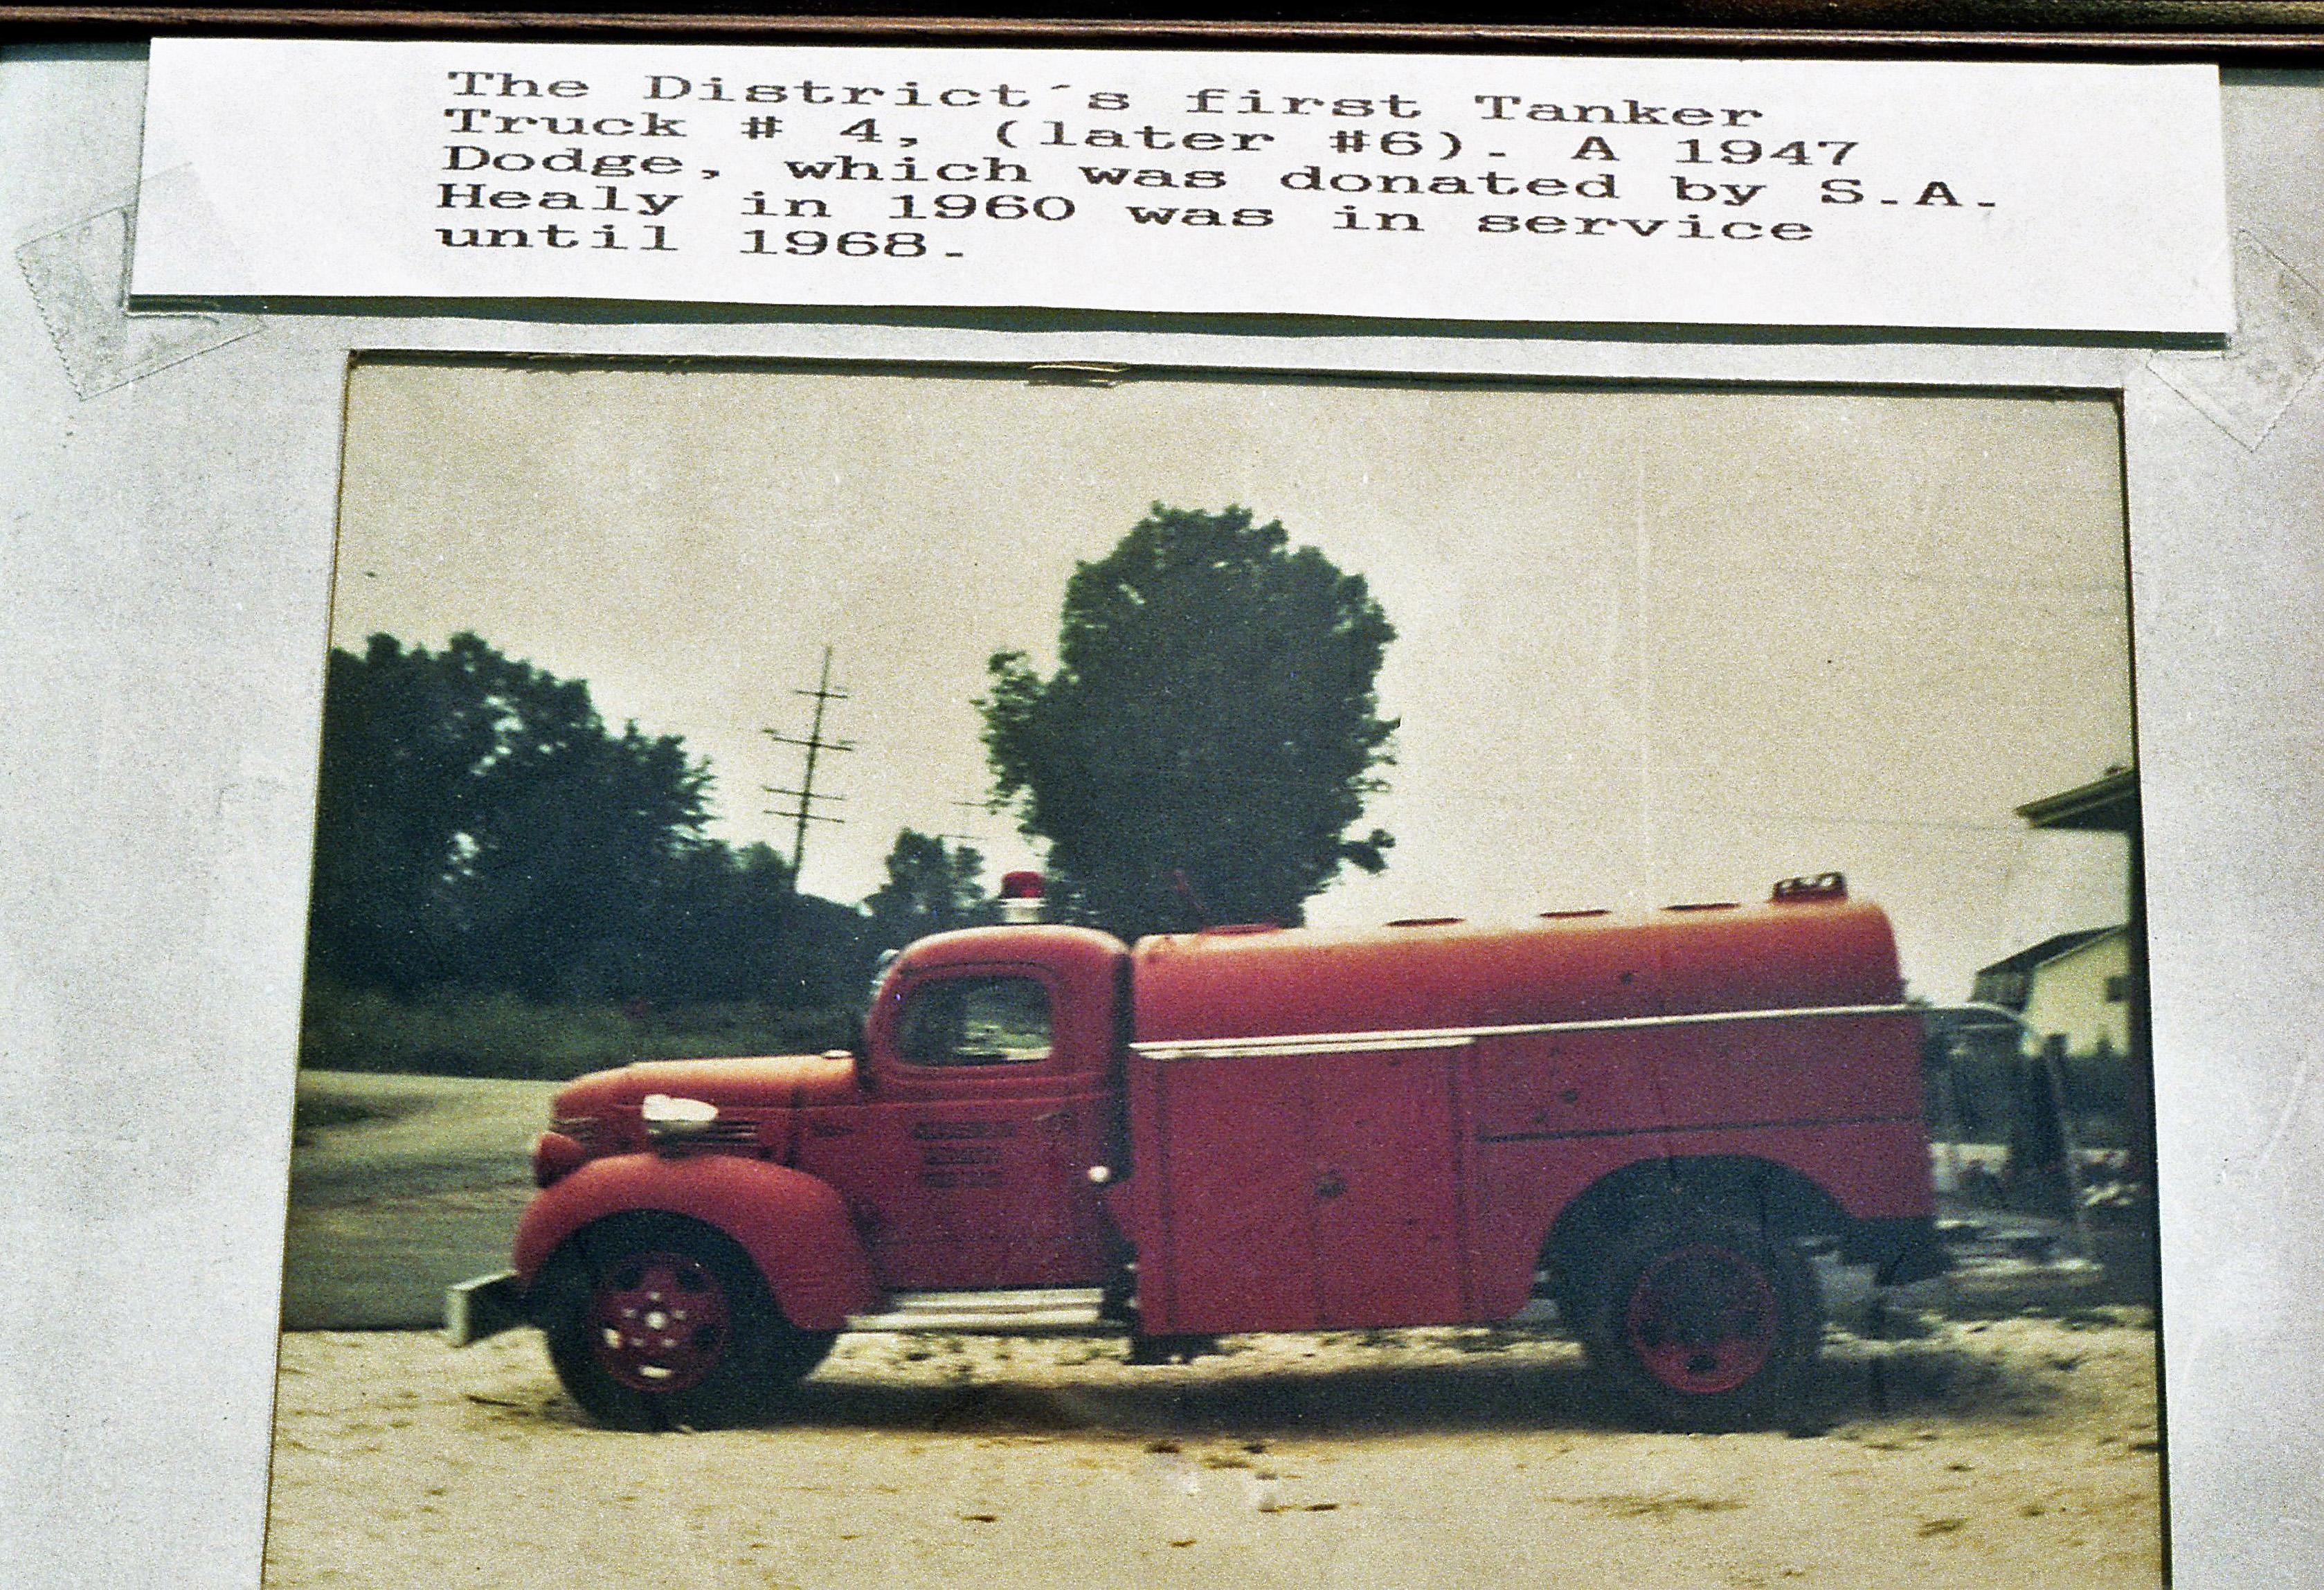 CLARENDON HEIGHTS TANKER 1947 DODGE - FD BUILT FIRST TANKER